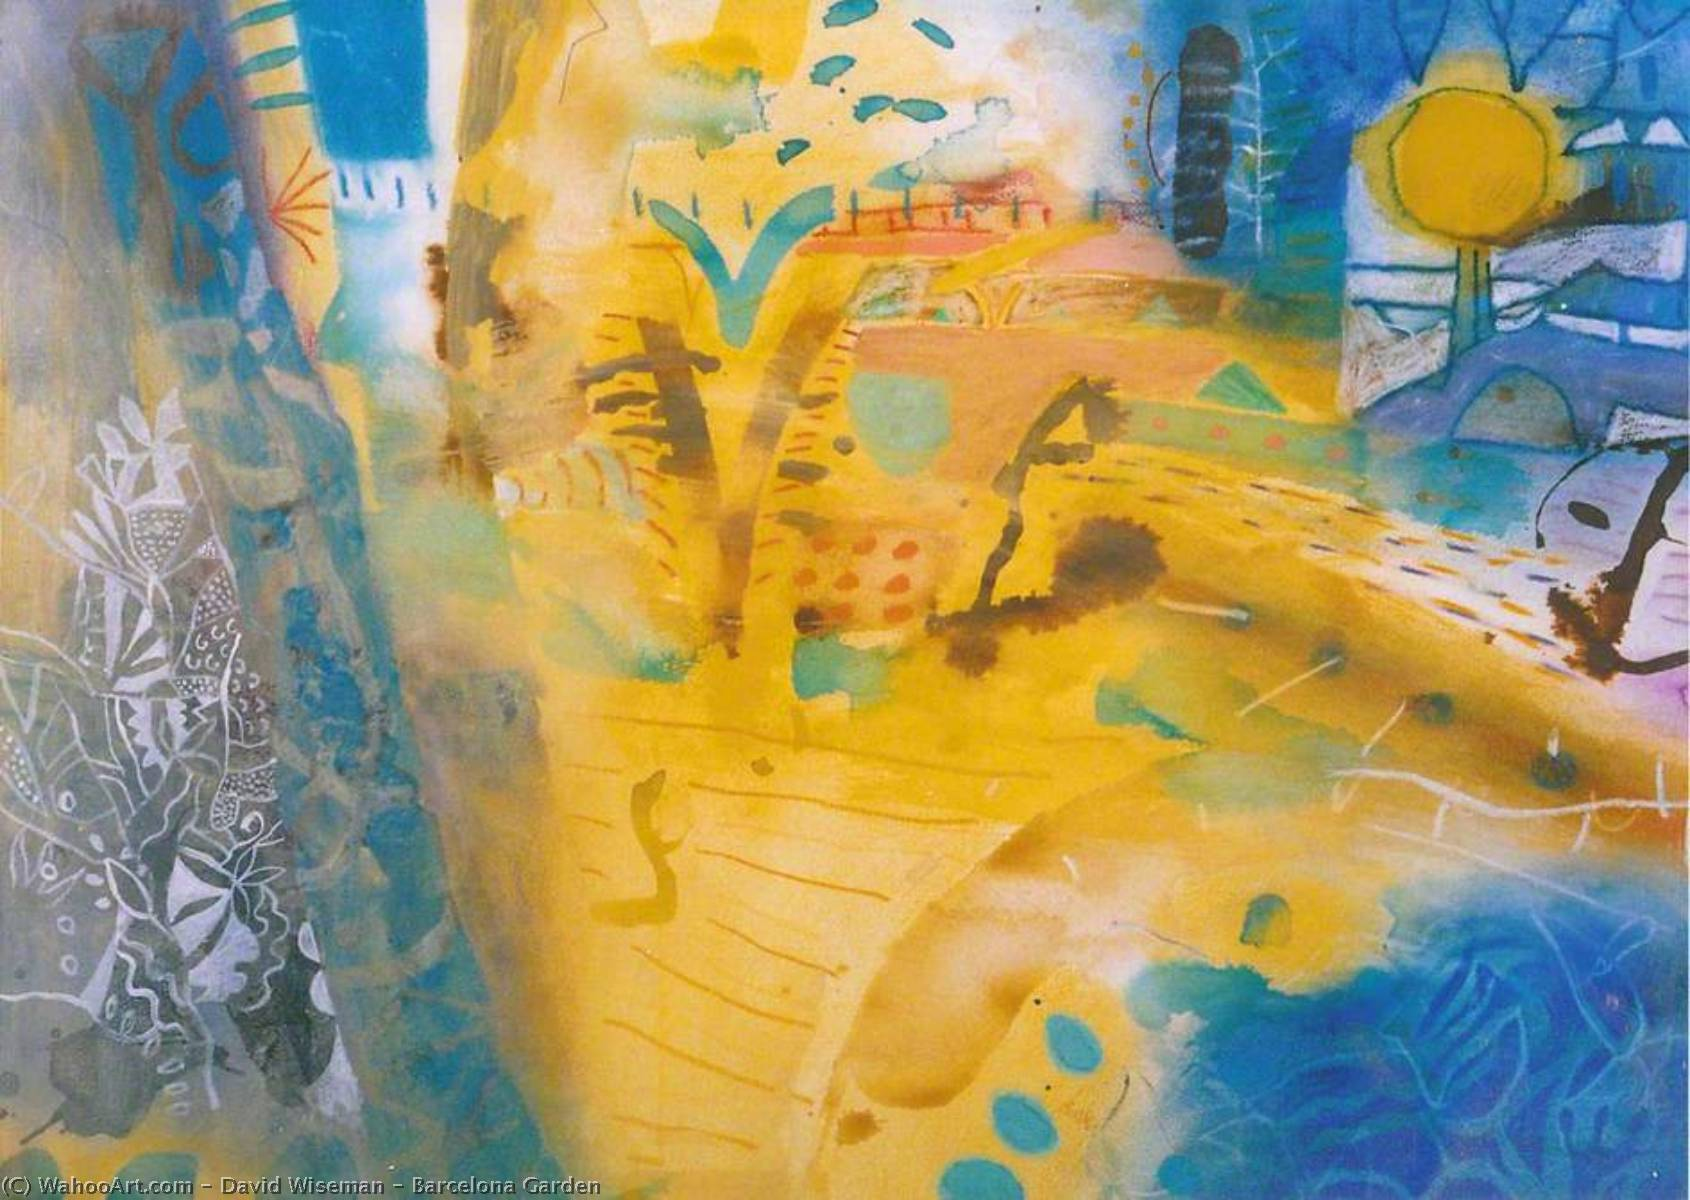 Wikioo.org - The Encyclopedia of Fine Arts - Painting, Artwork by David Wiseman - Barcelona Garden